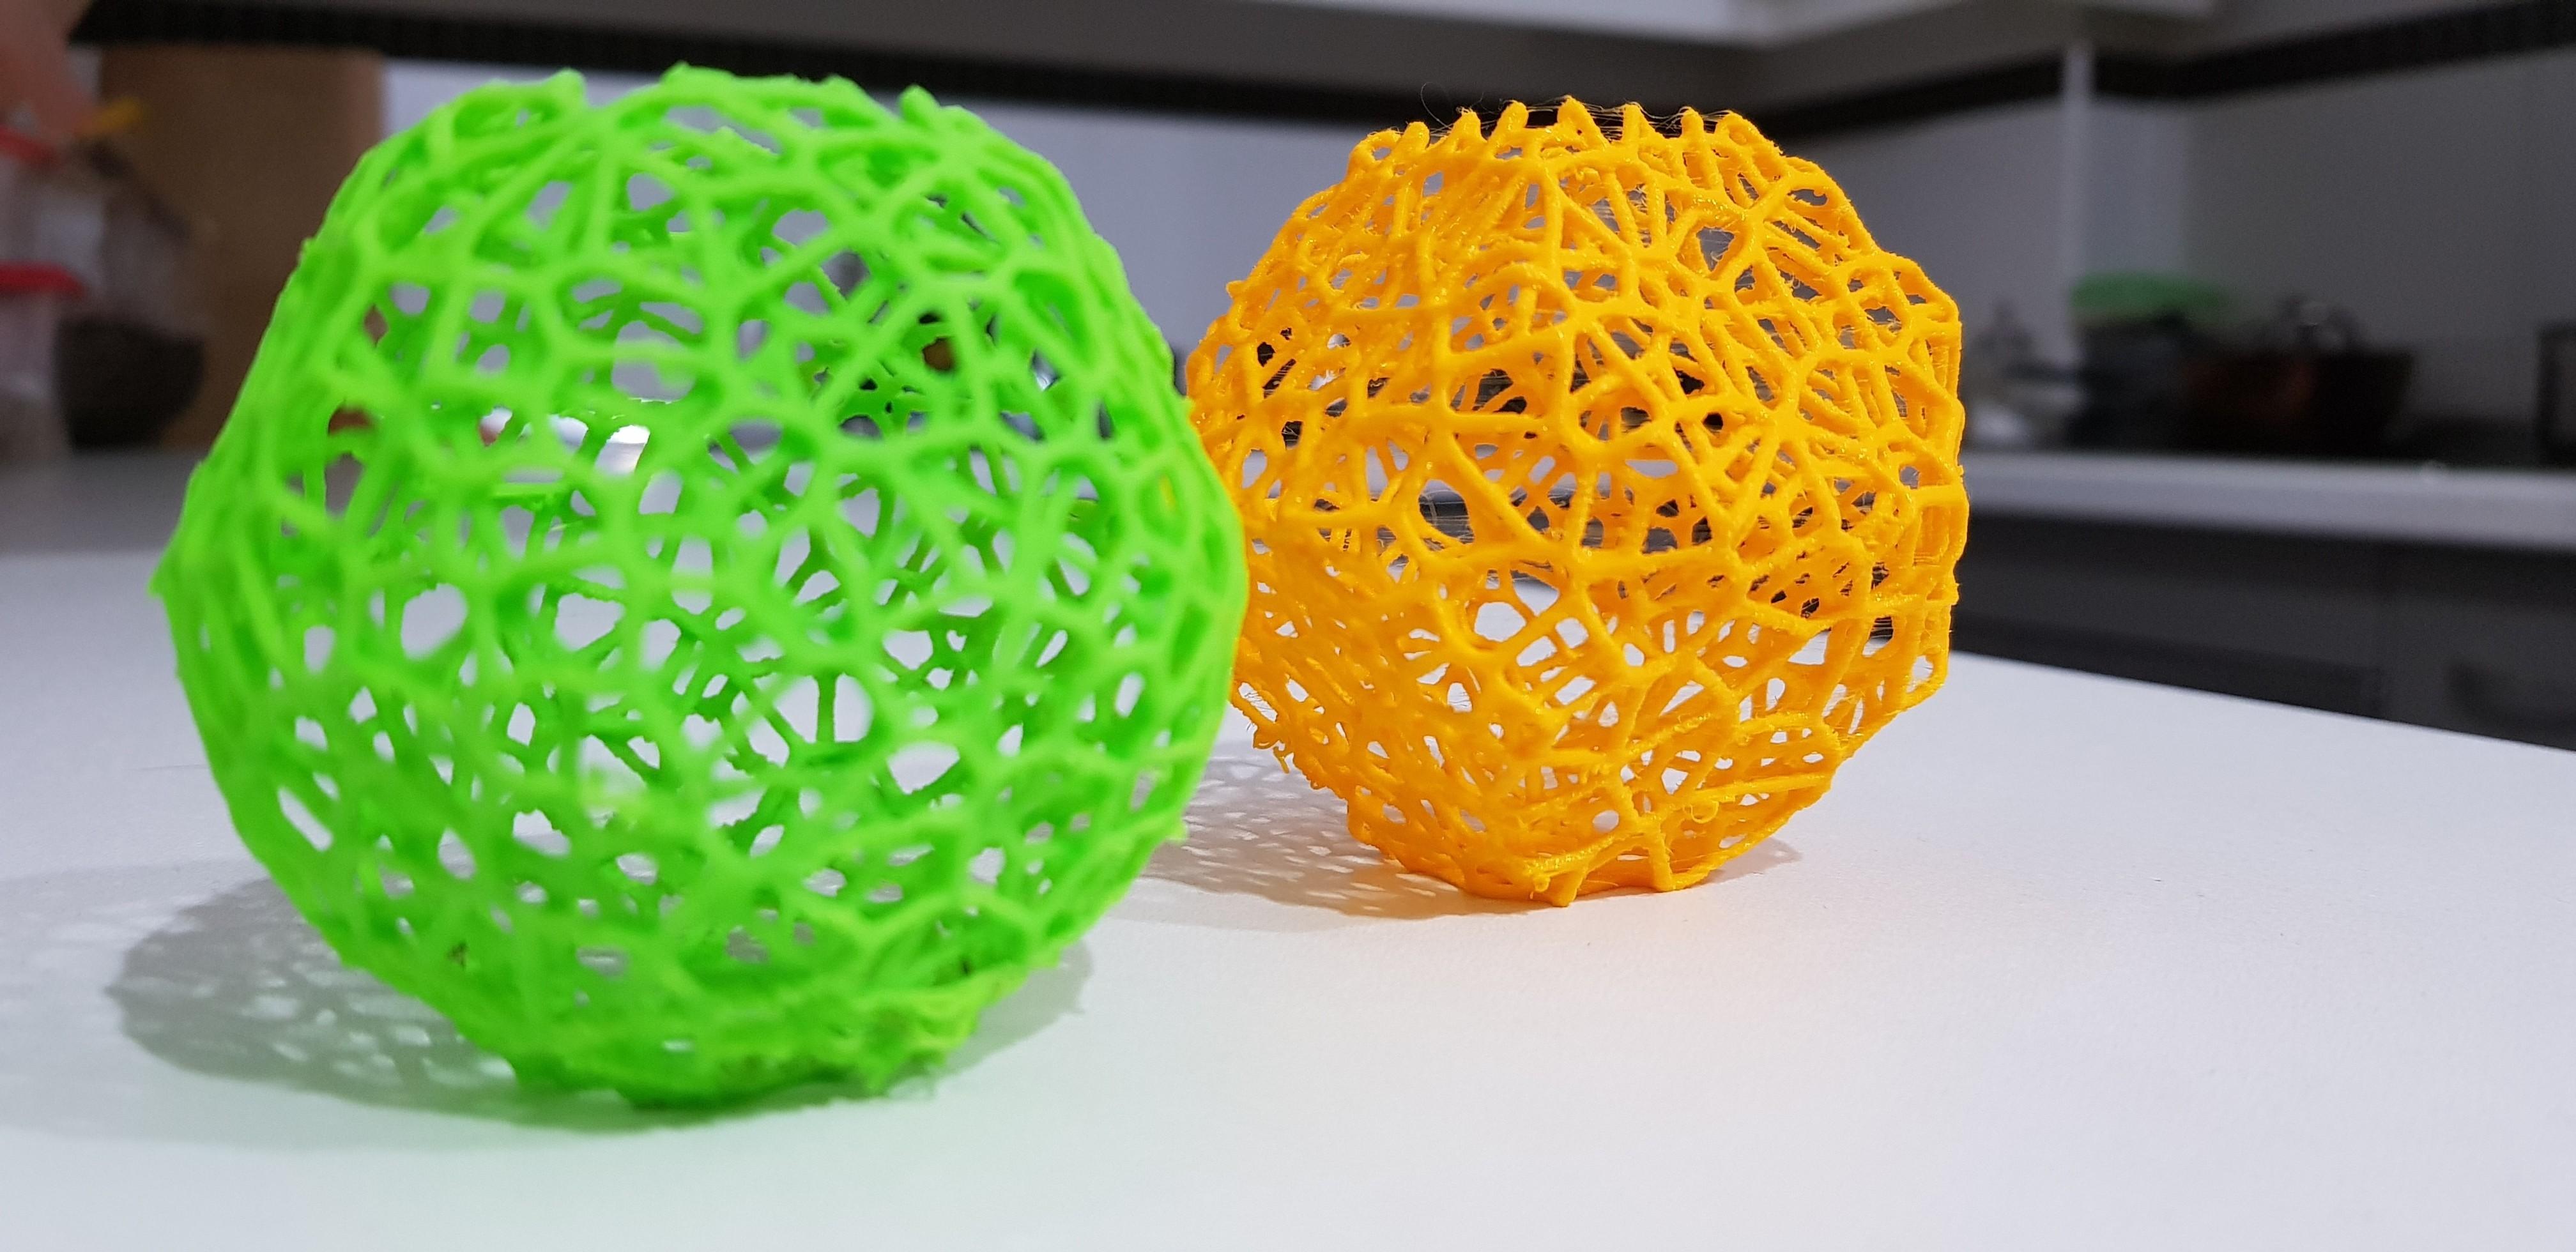 20180616_223439.jpg Download free STL file voronoi pot • 3D printer template, solunkejagruti